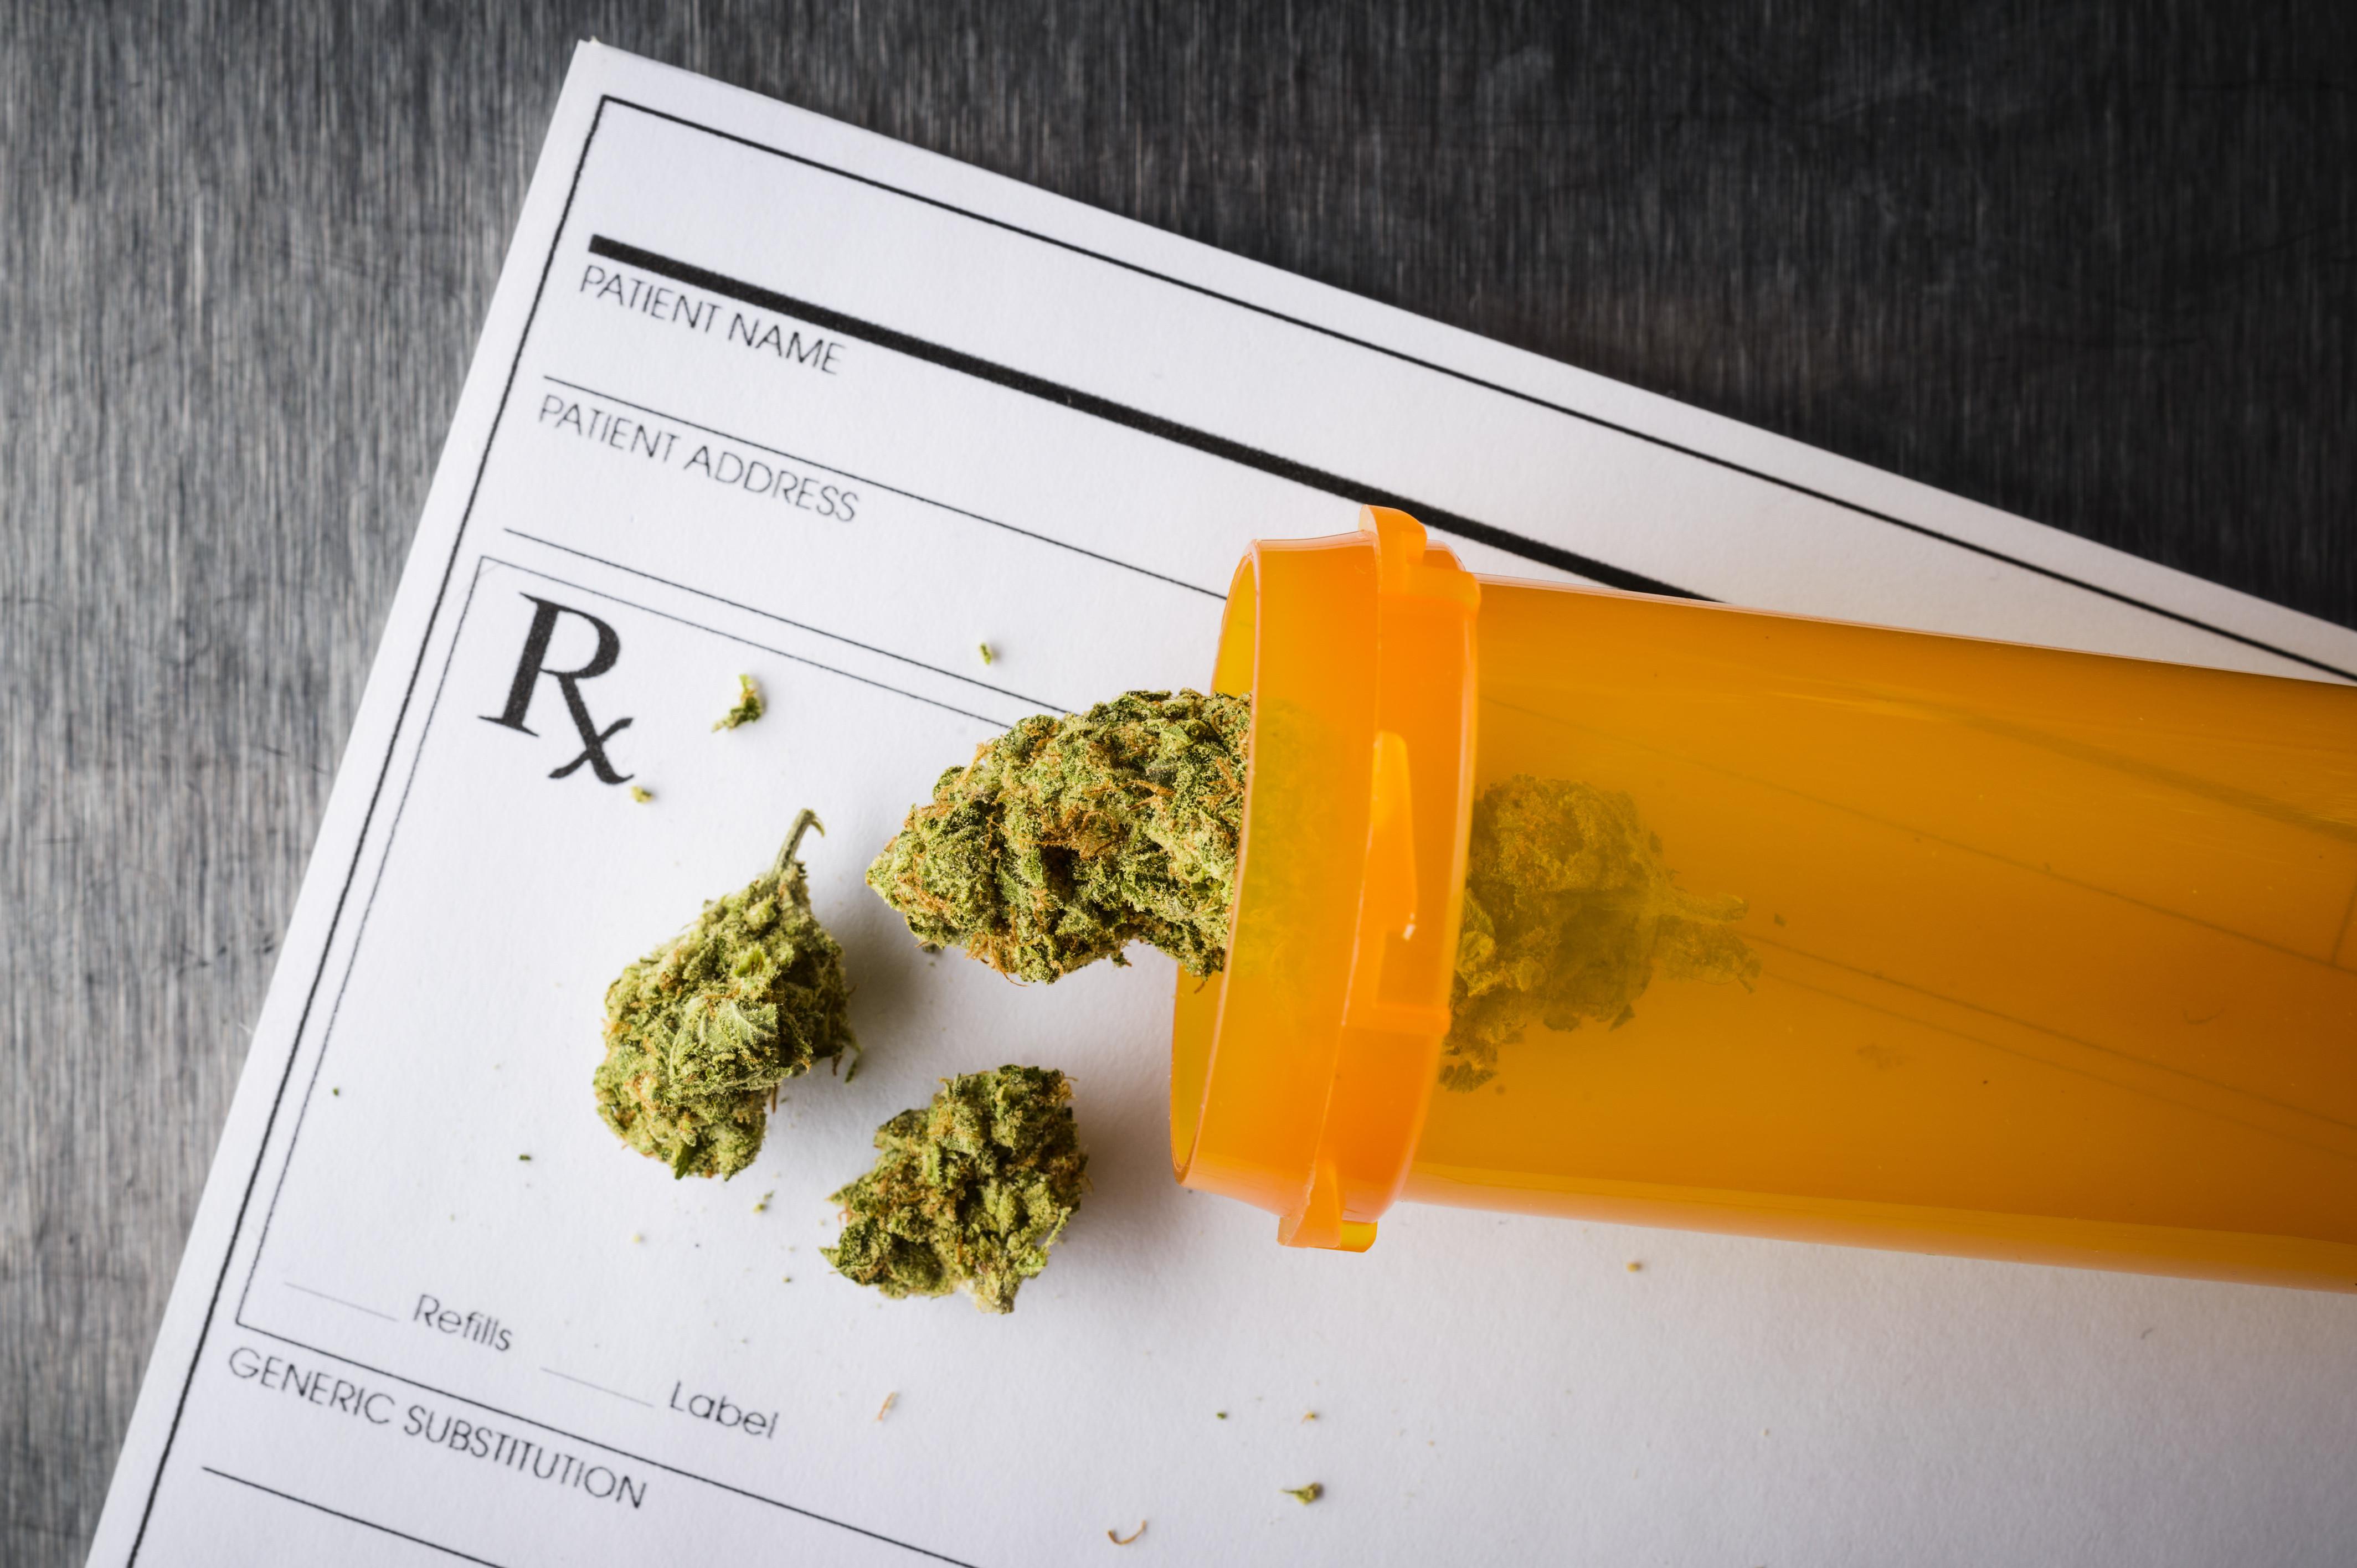 Free Medical Cannabis Consultation